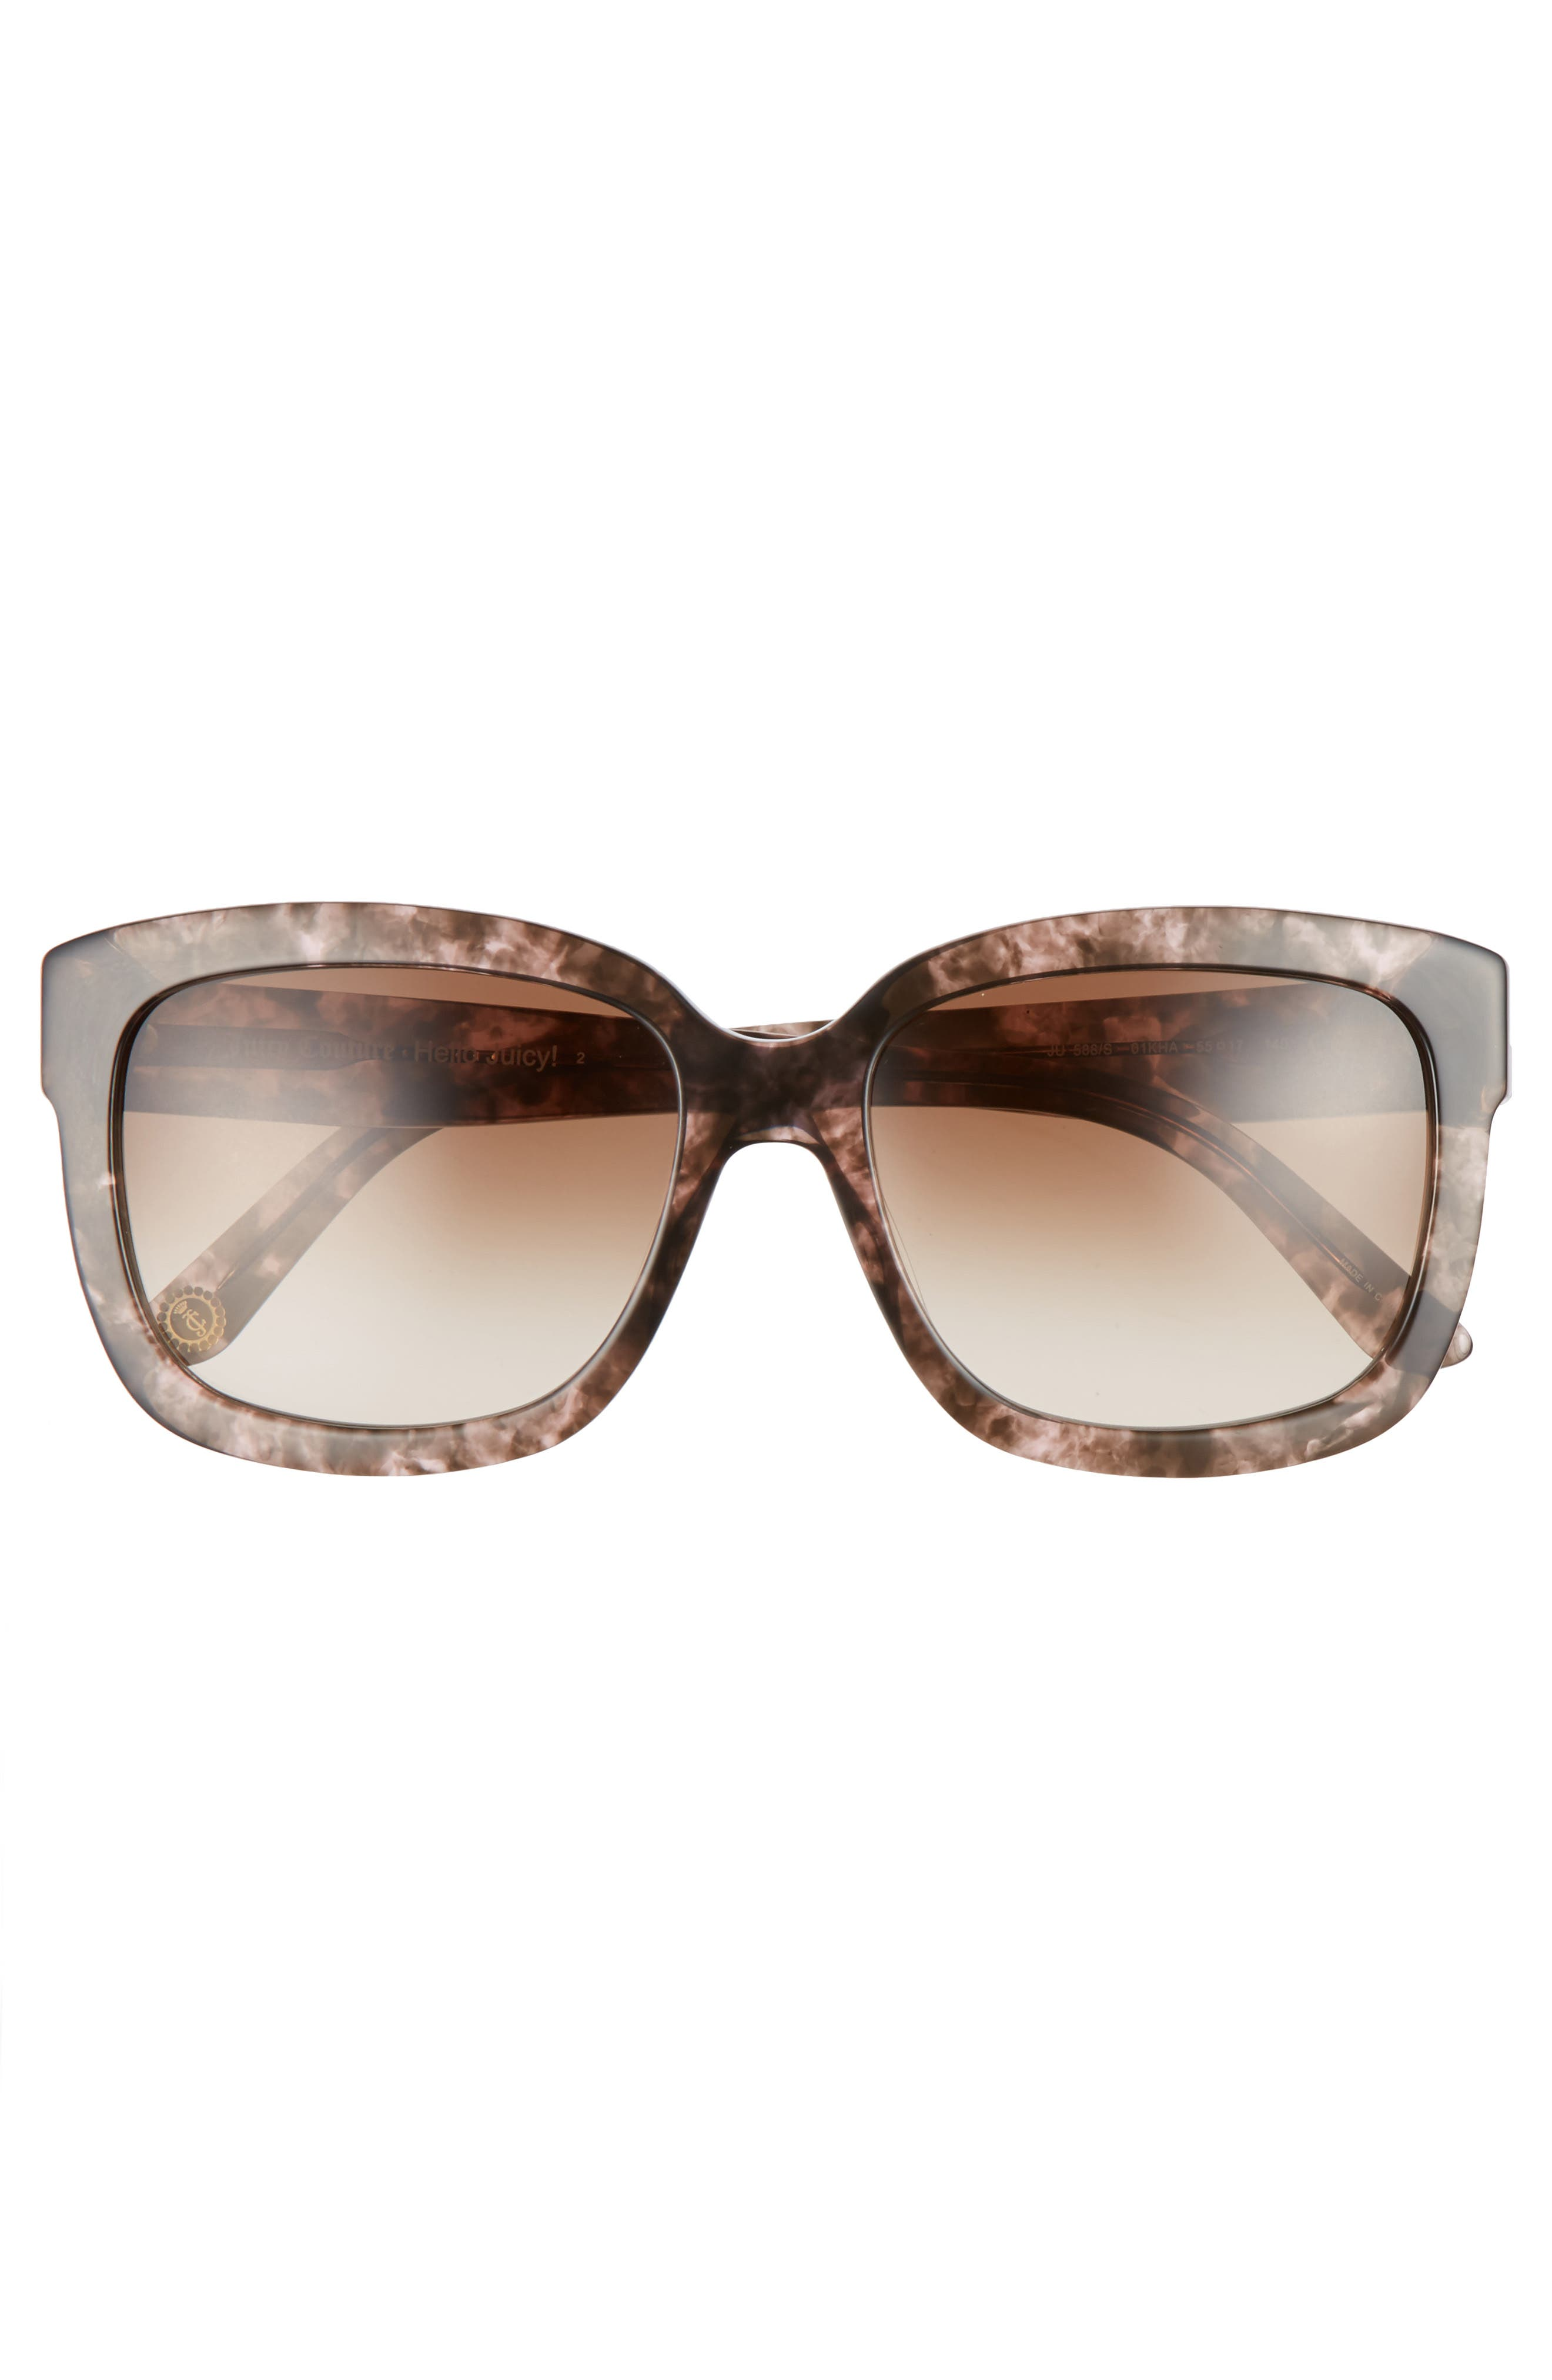 Black Label 55mm Square Sunglasses,                             Alternate thumbnail 3, color,                             210